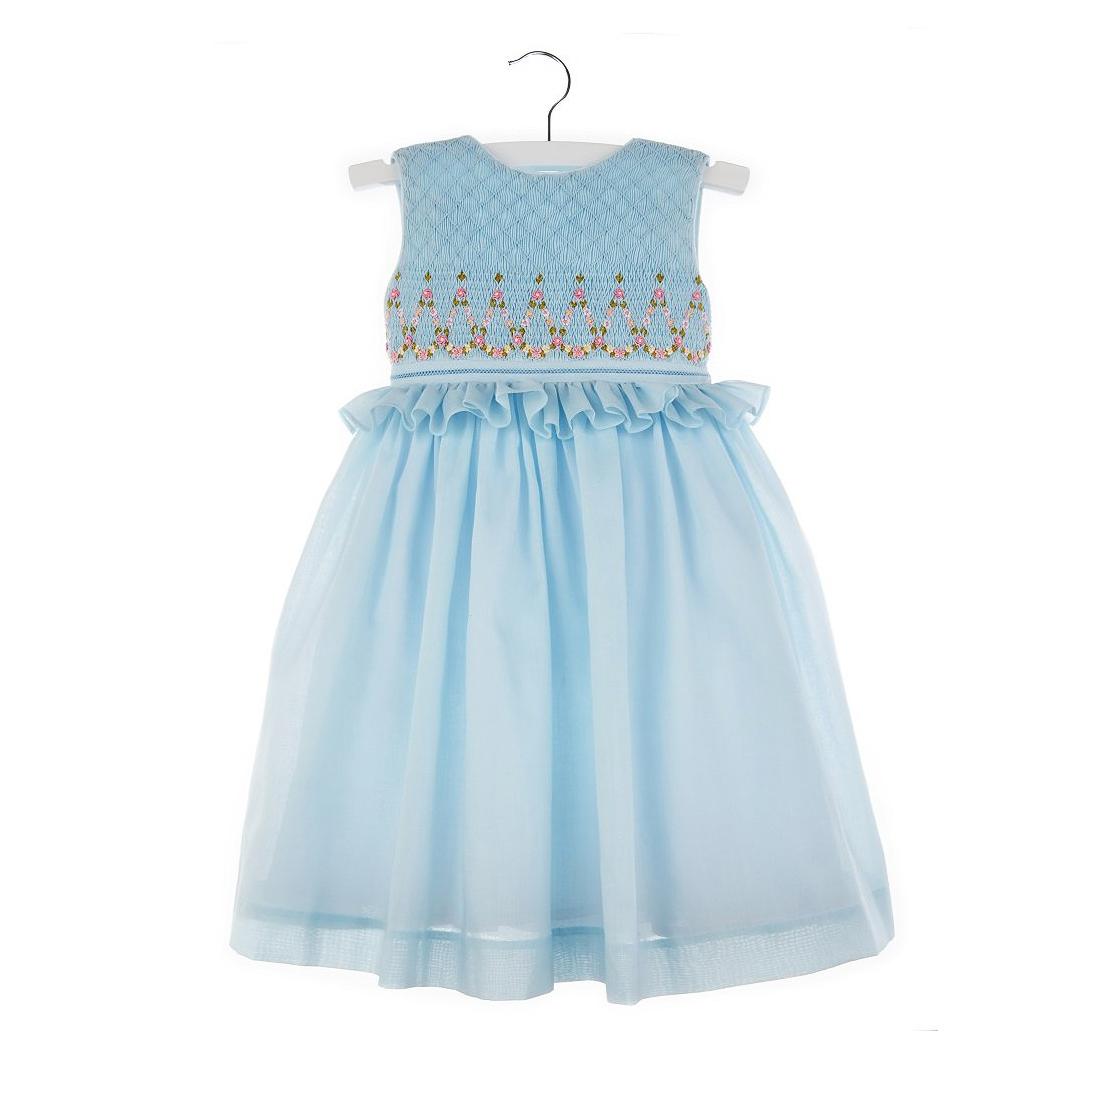 summer flower girl outfit blue frilly dress